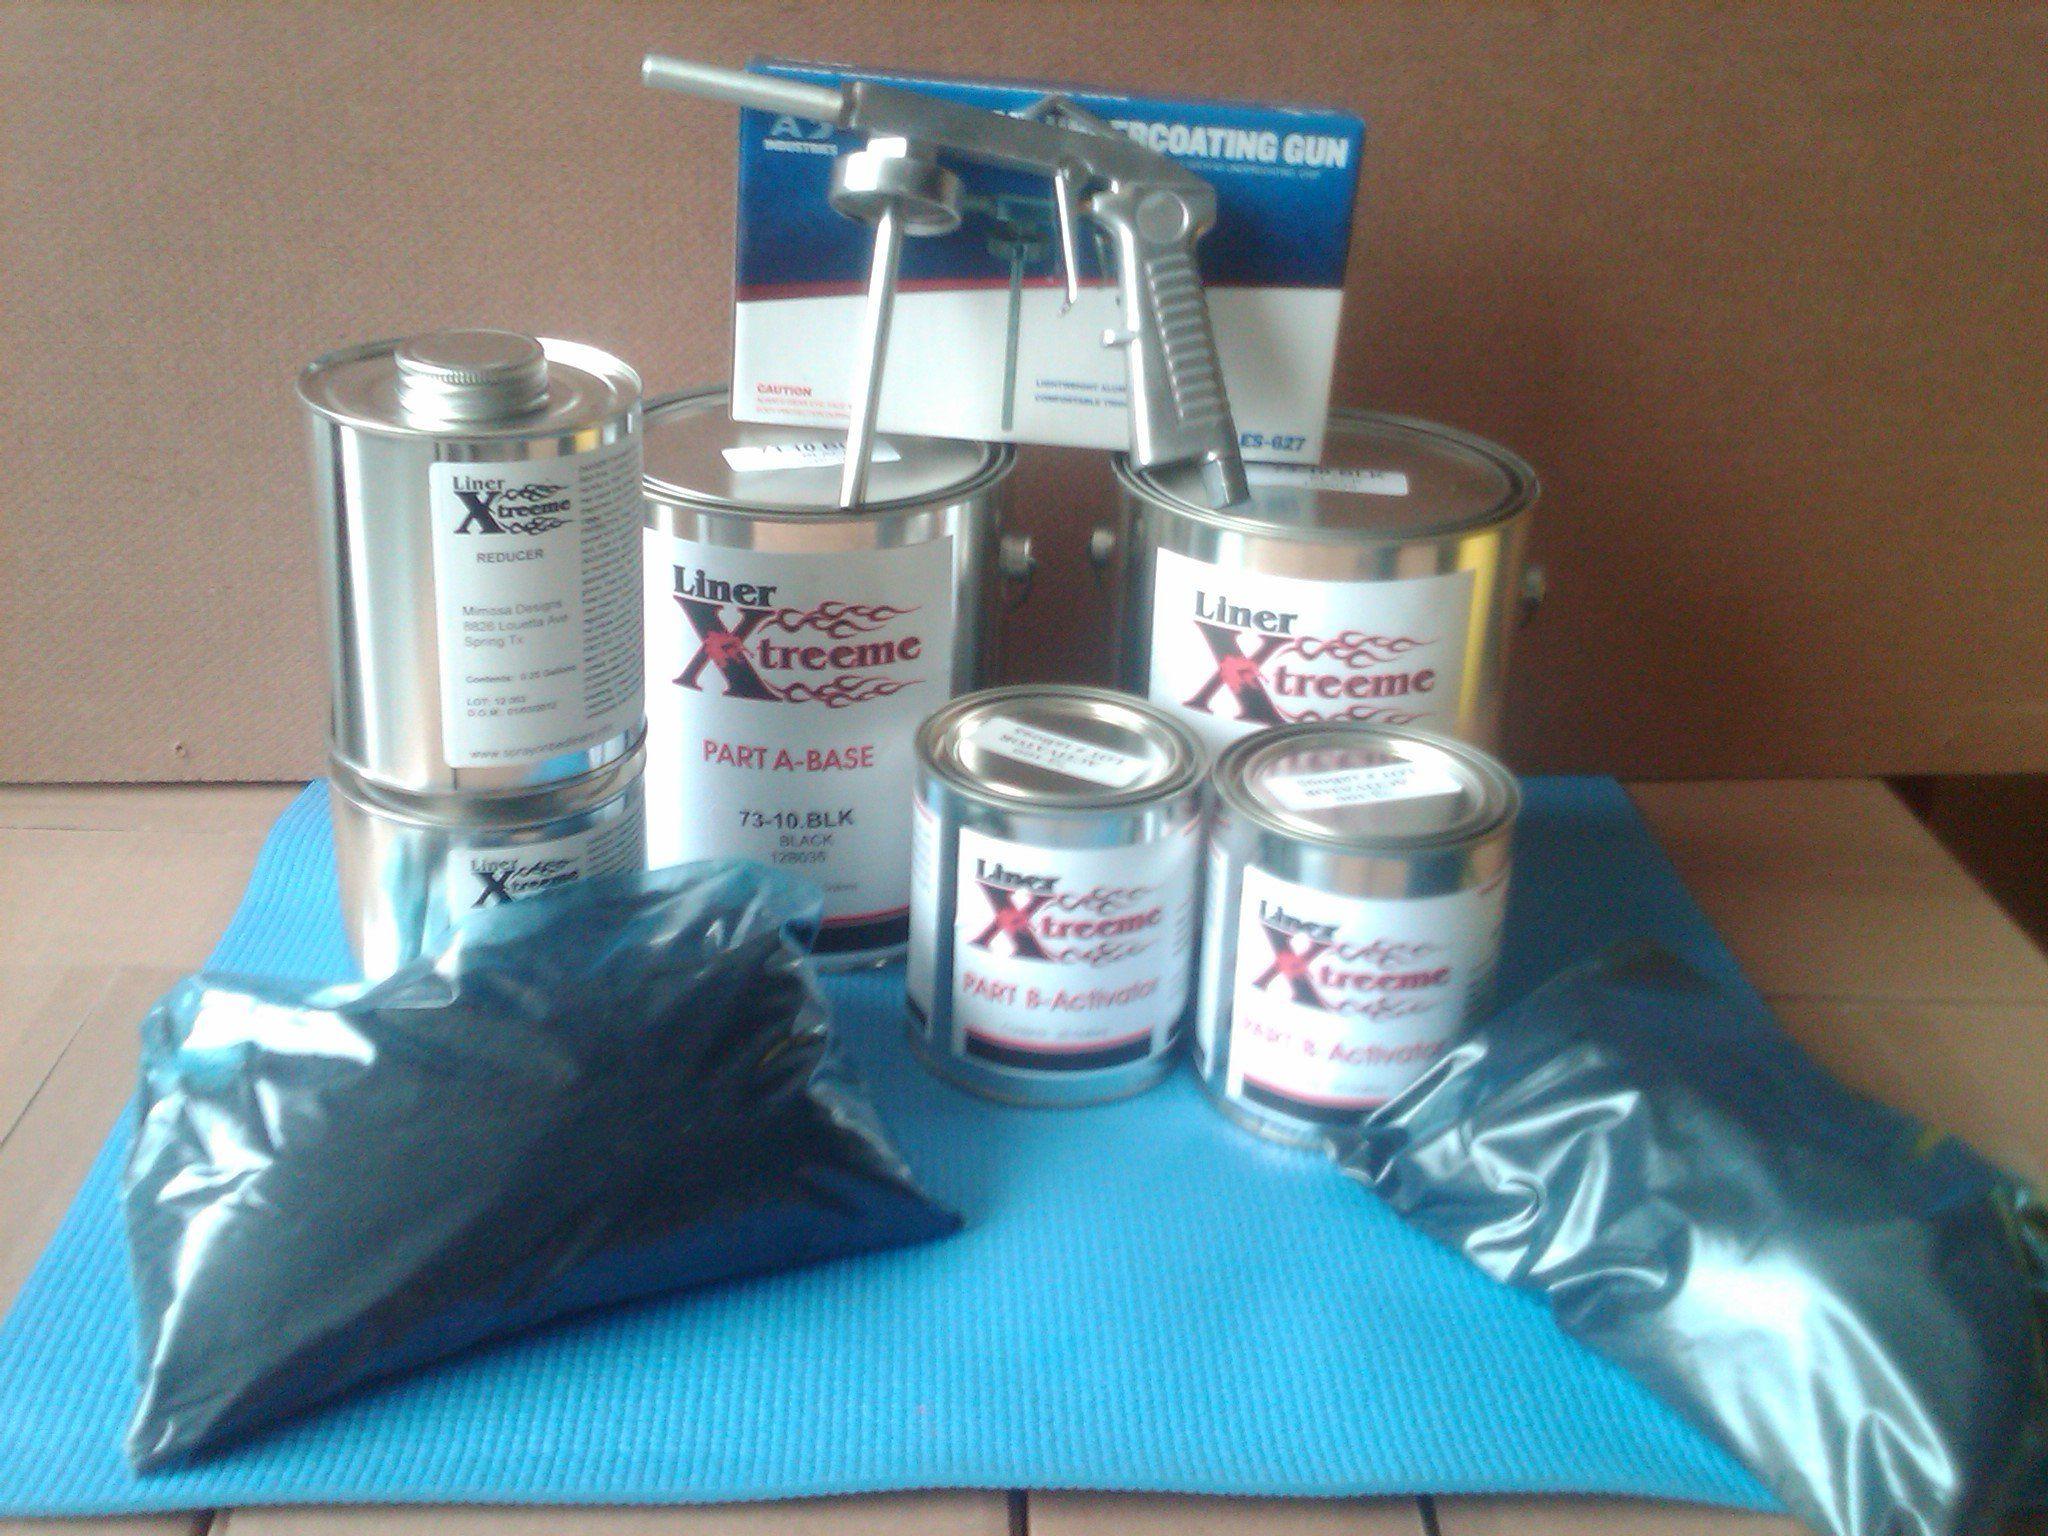 Linerxtreeme spray on Bedliner Kit 3 gallon Black with GUN